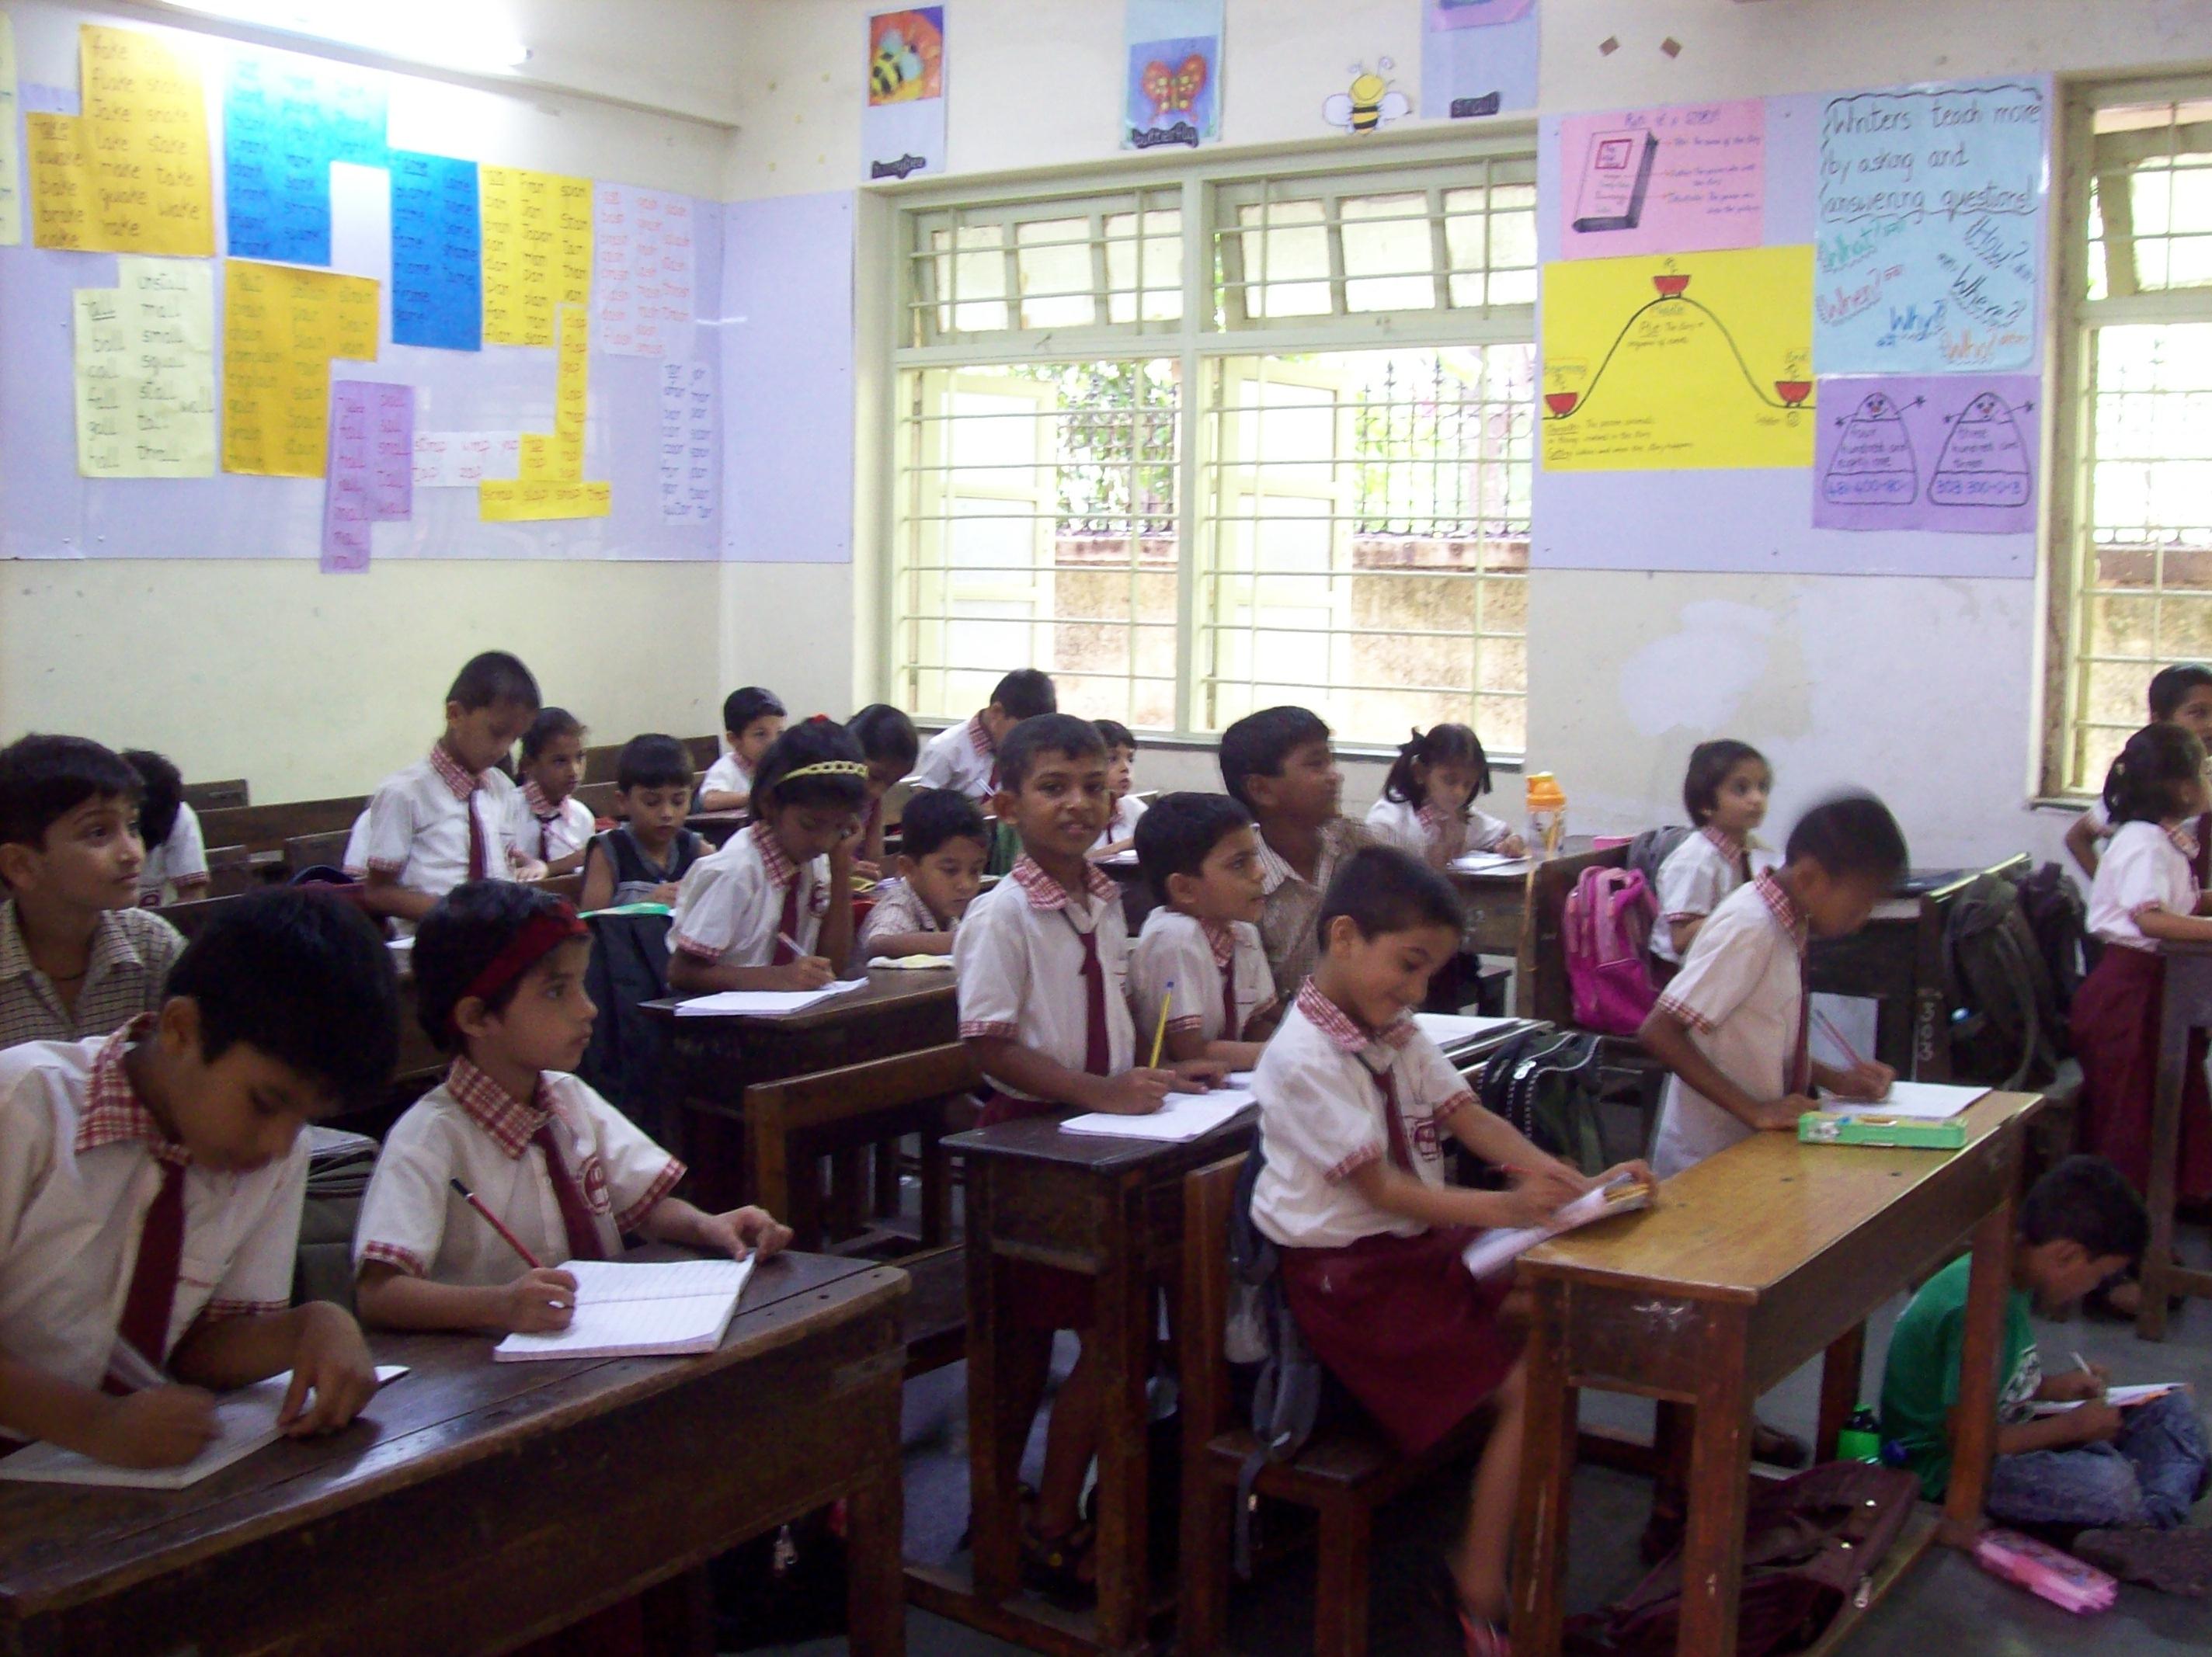 indian schools Indian valley local schools: 100 n walnut street, po box 171 gnadenhutten, oh 44629 (p) 7402544334 • (f) 7402549271.